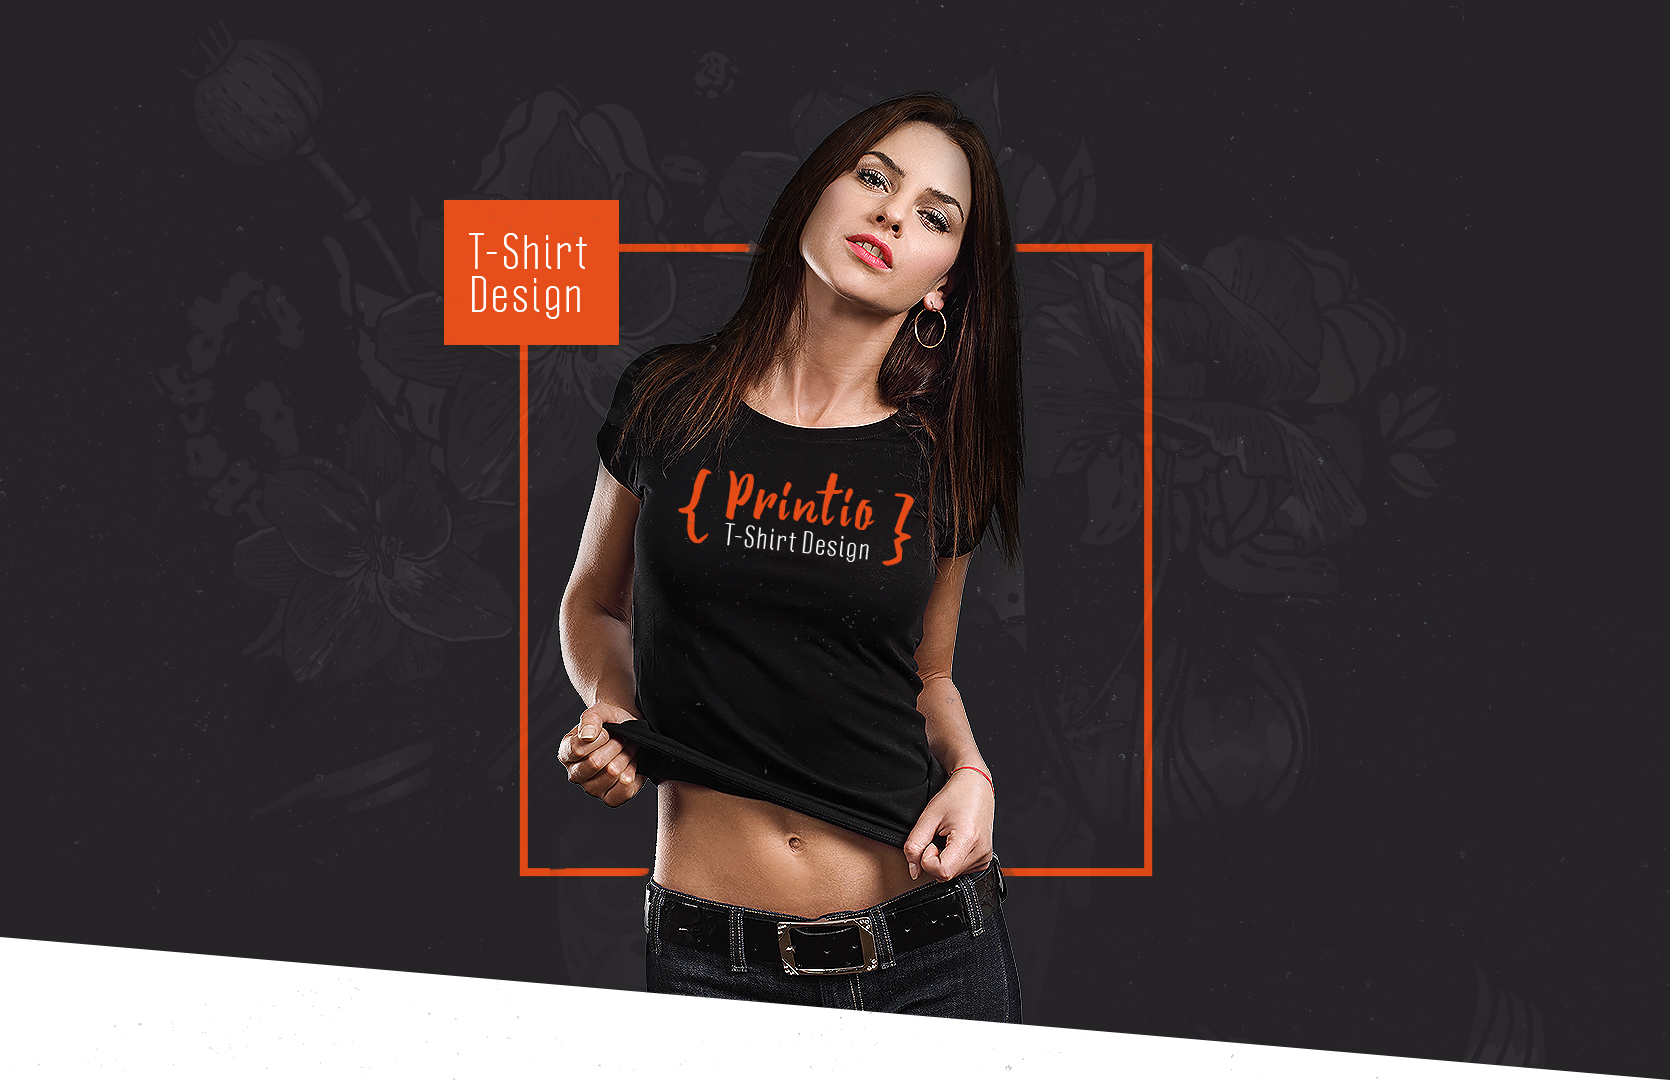 Design t shirt websites - Design T Shirt Websites 58